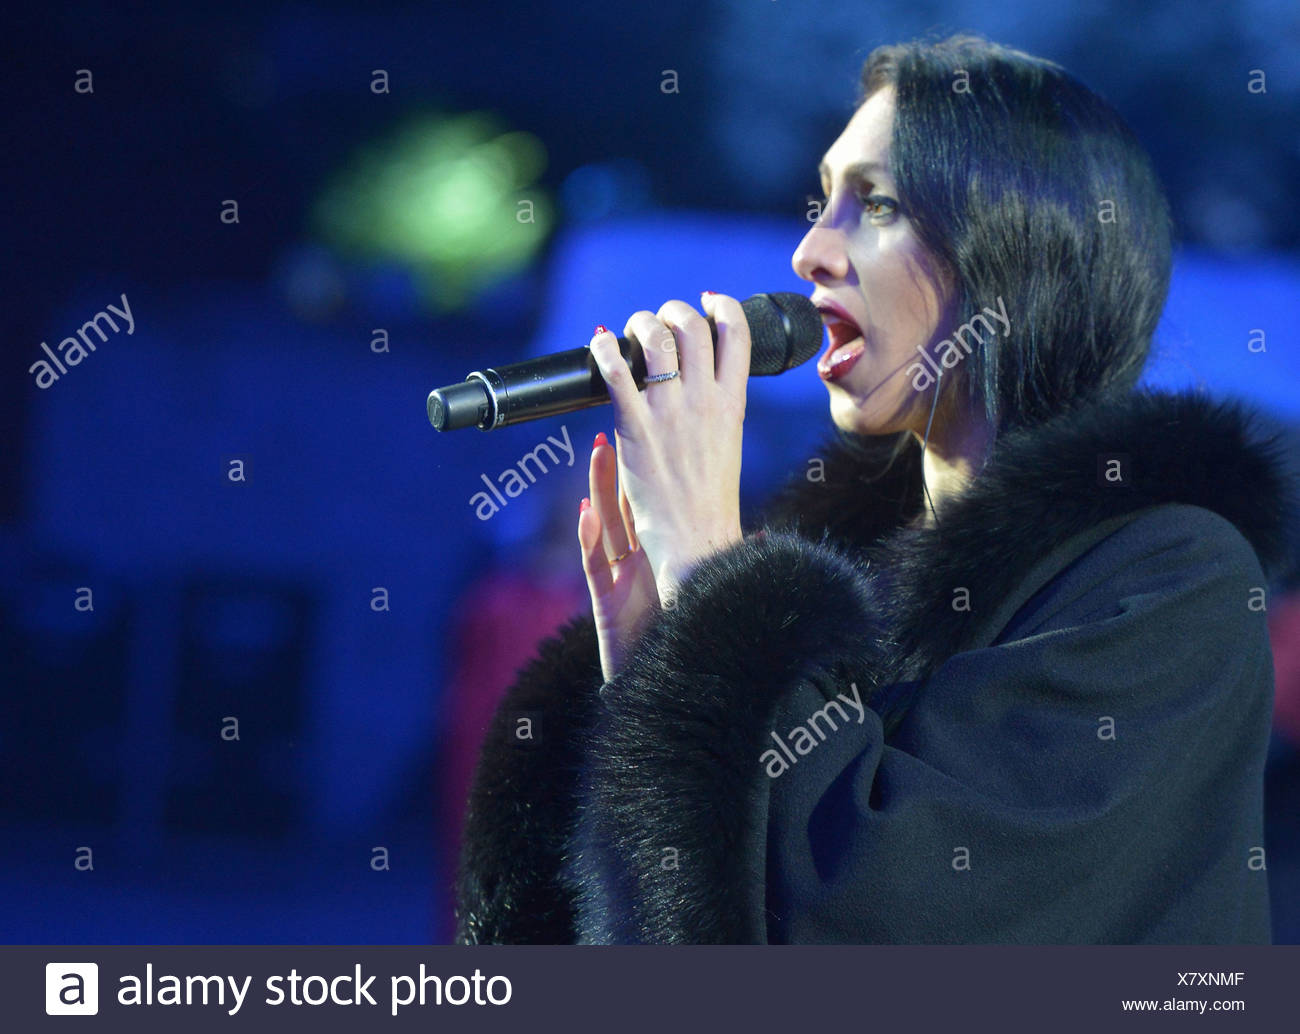 Patty singer